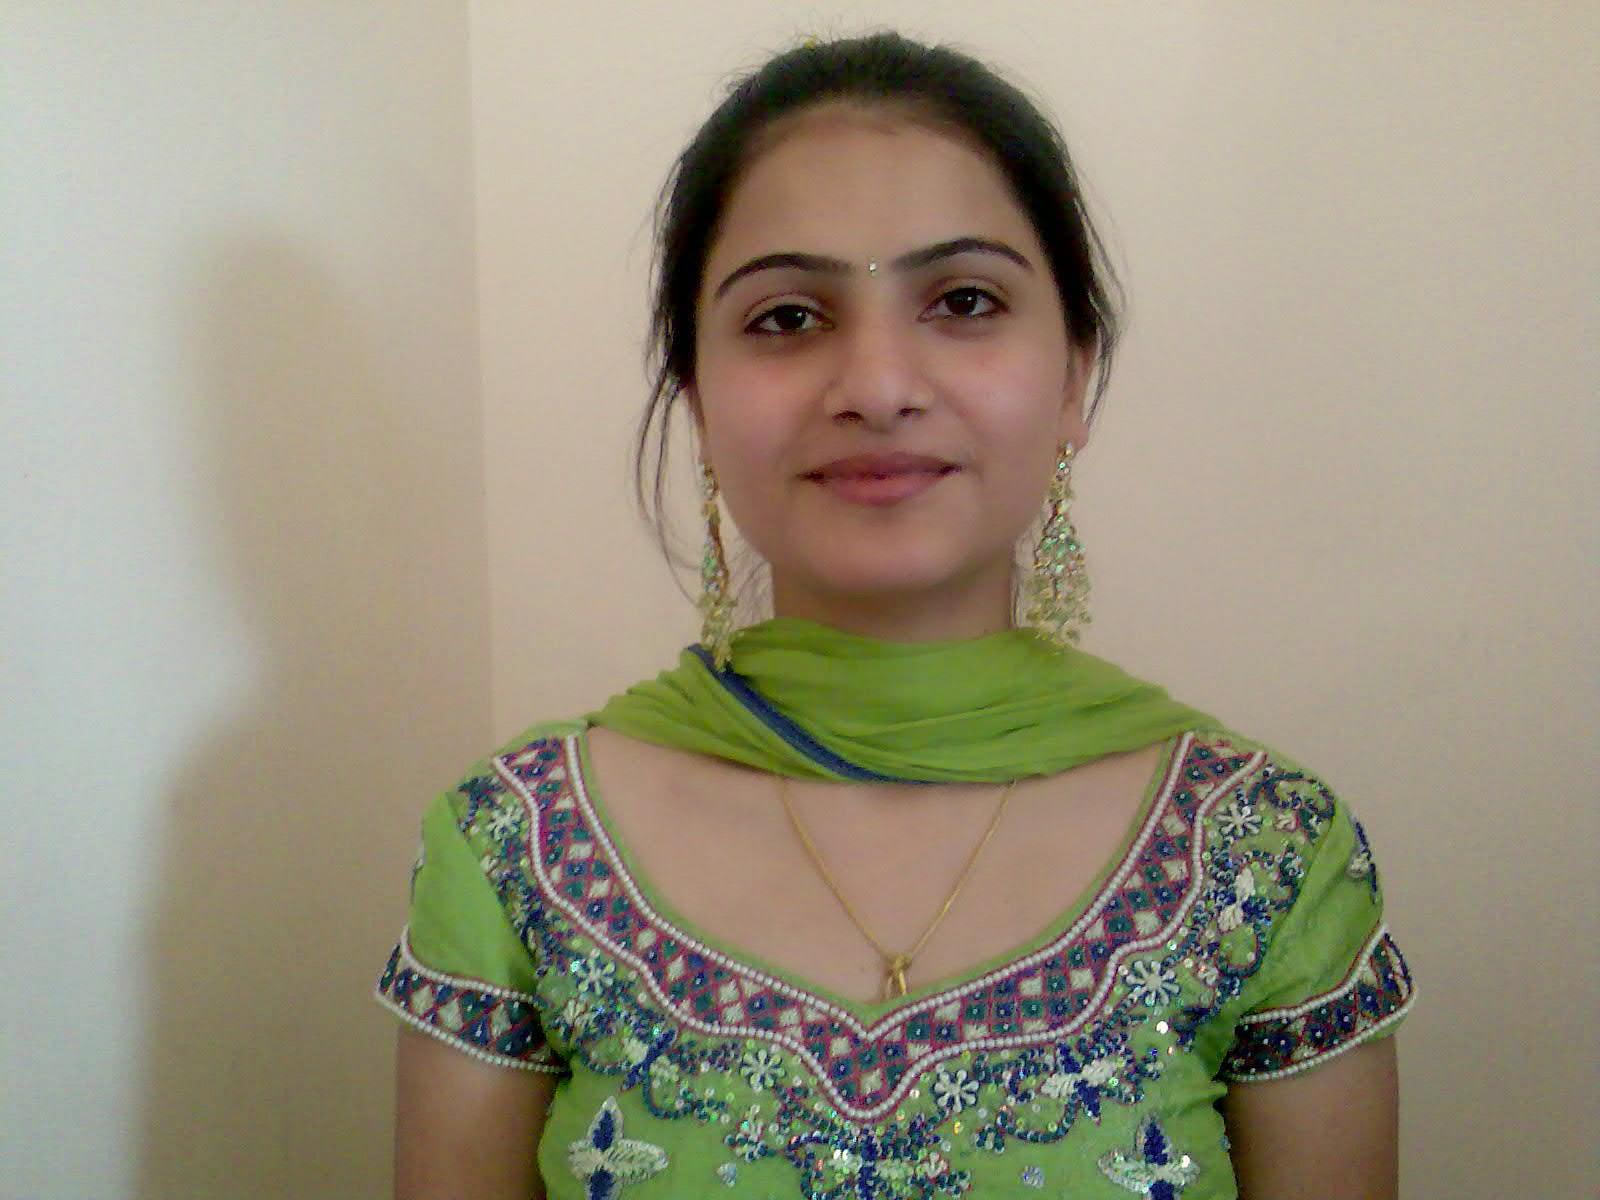 Indian Girls Photos Free Download - Beautiful Desi Sexy Girls Hot ...